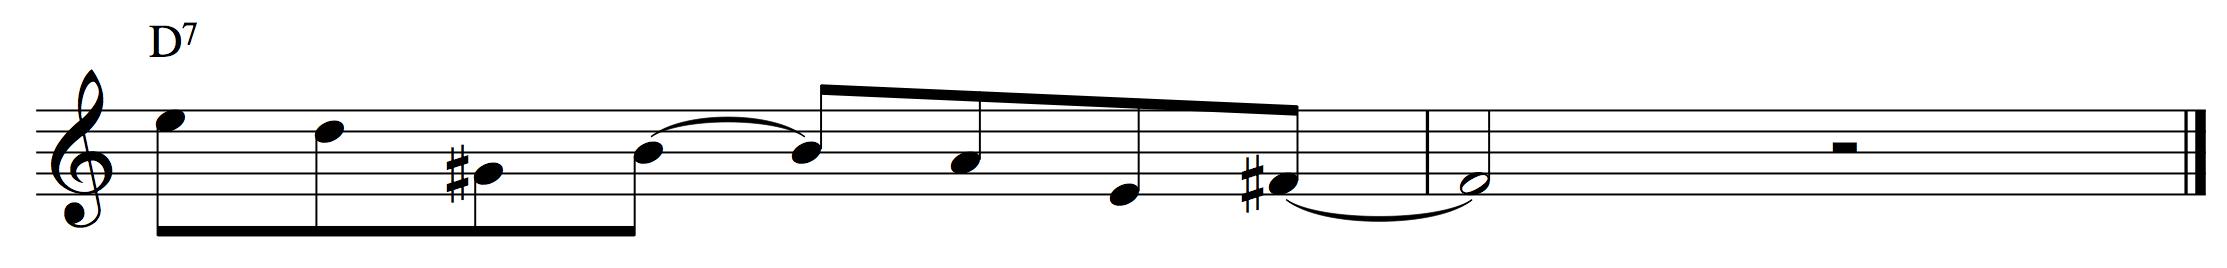 studying jazz piano